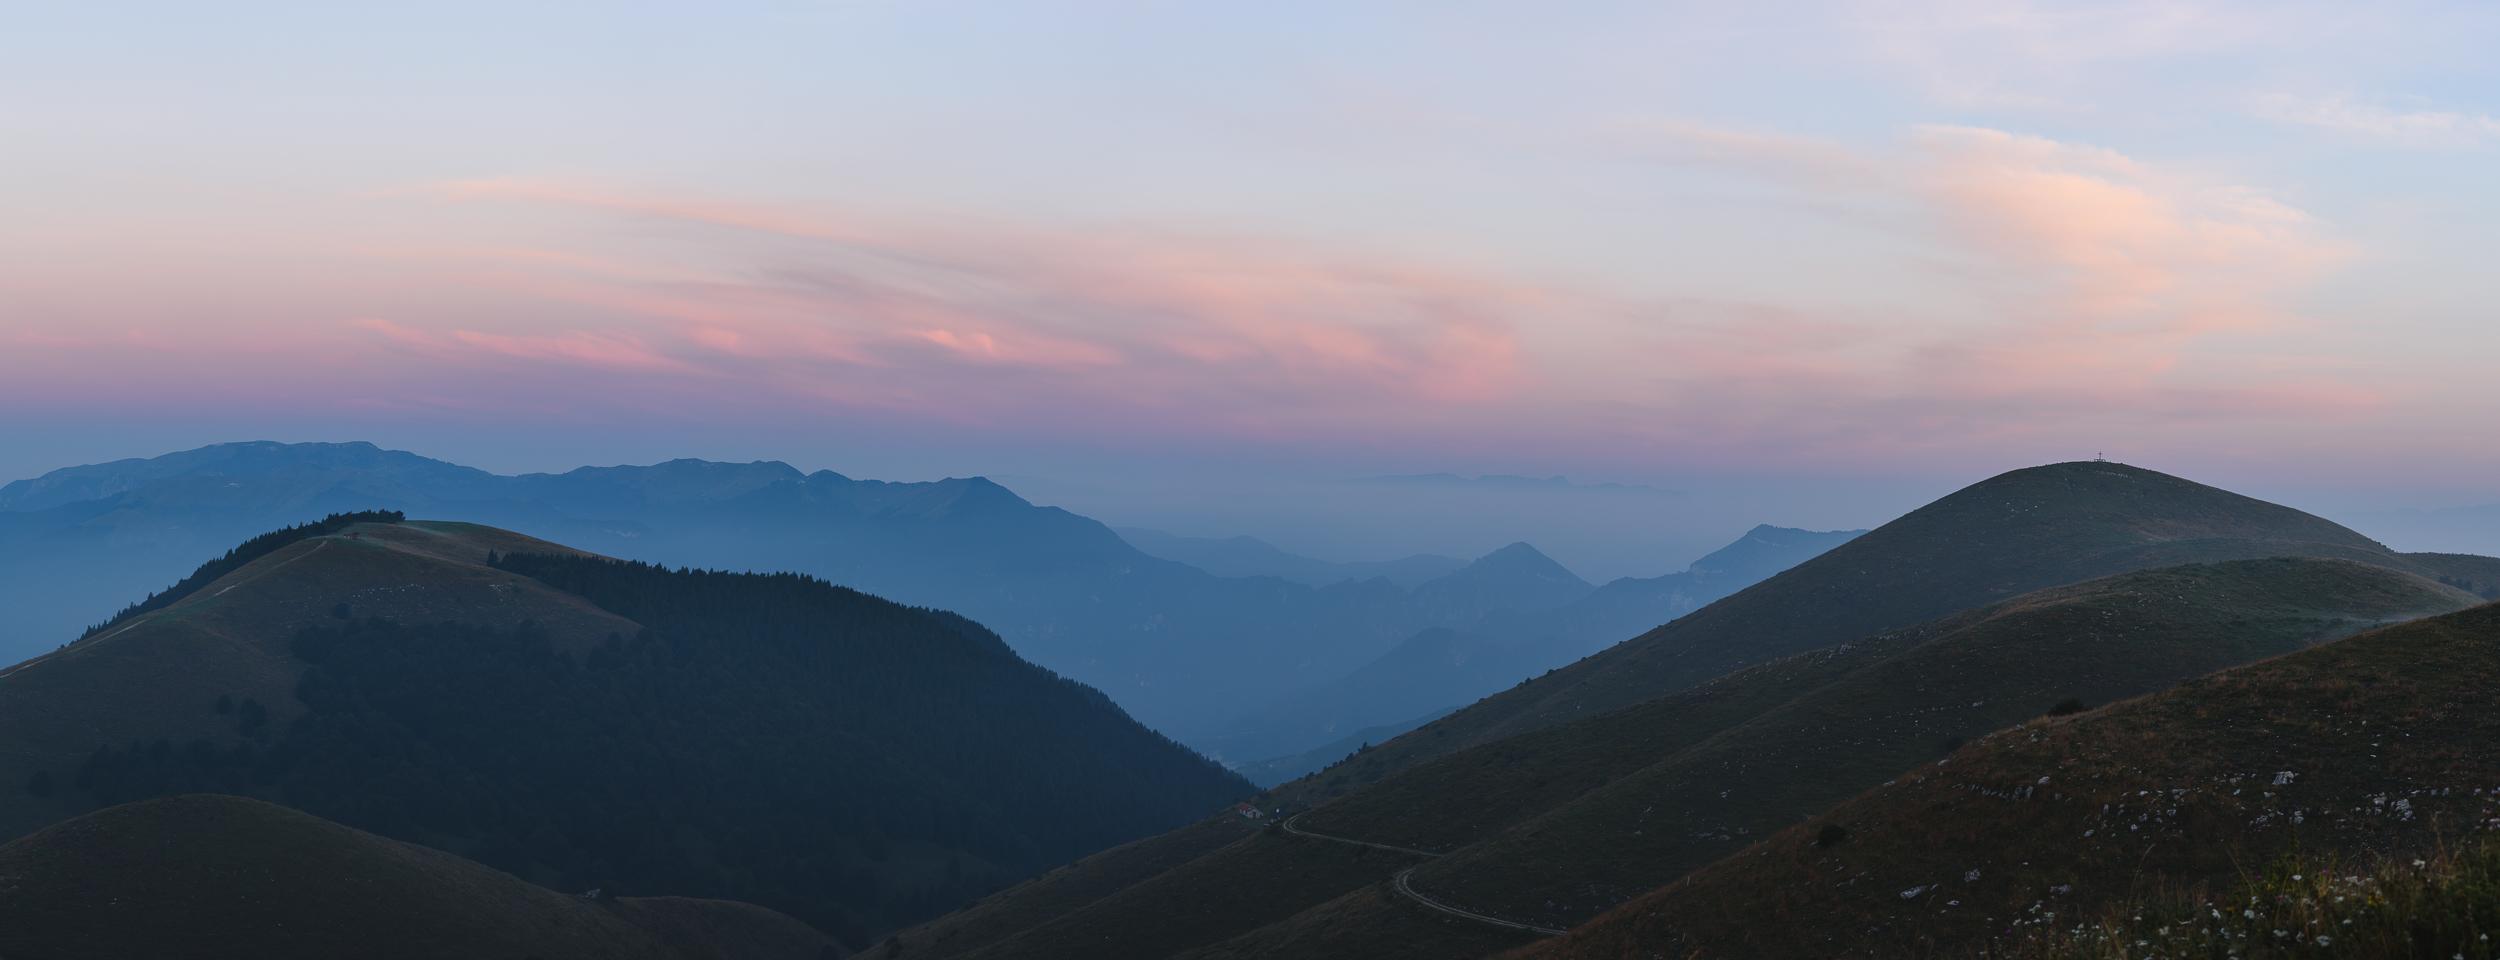 2018-08-11_Web__colourful sunrise panorama_.jpg